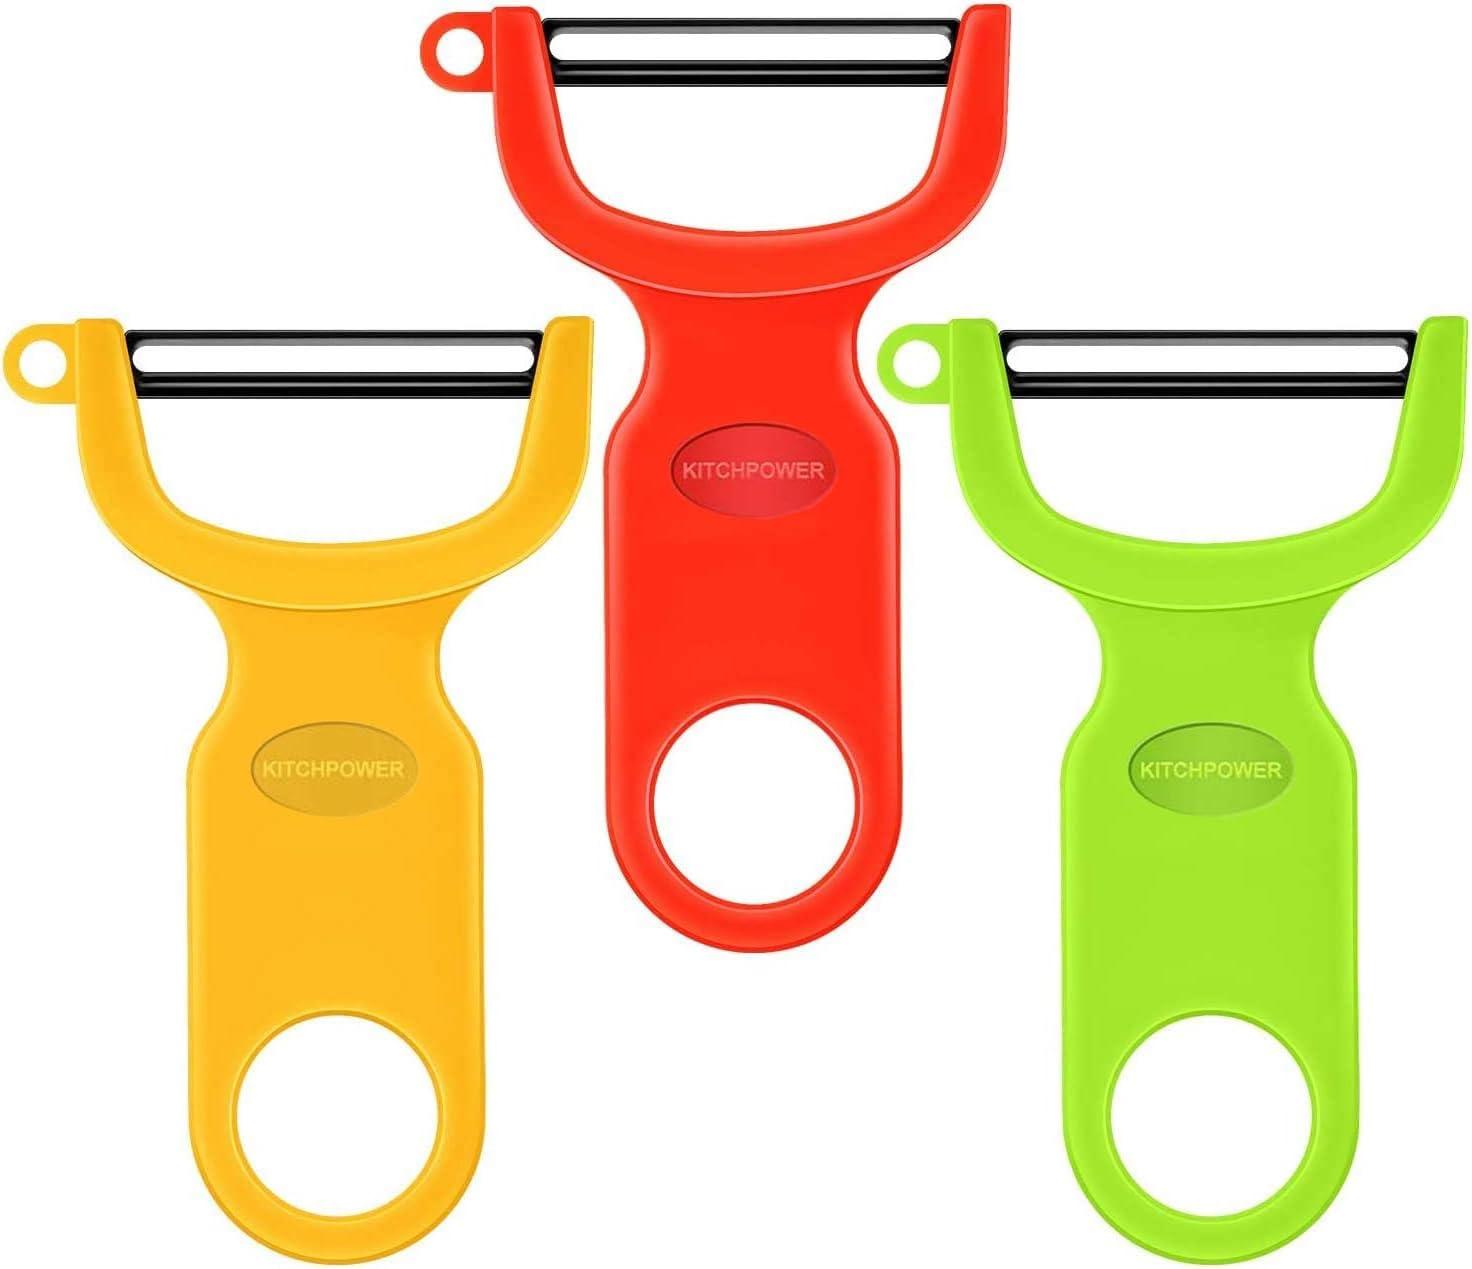 Original Vegetable Peeler Carbon Steel Blade 3-Pack Red/Green/Yellow